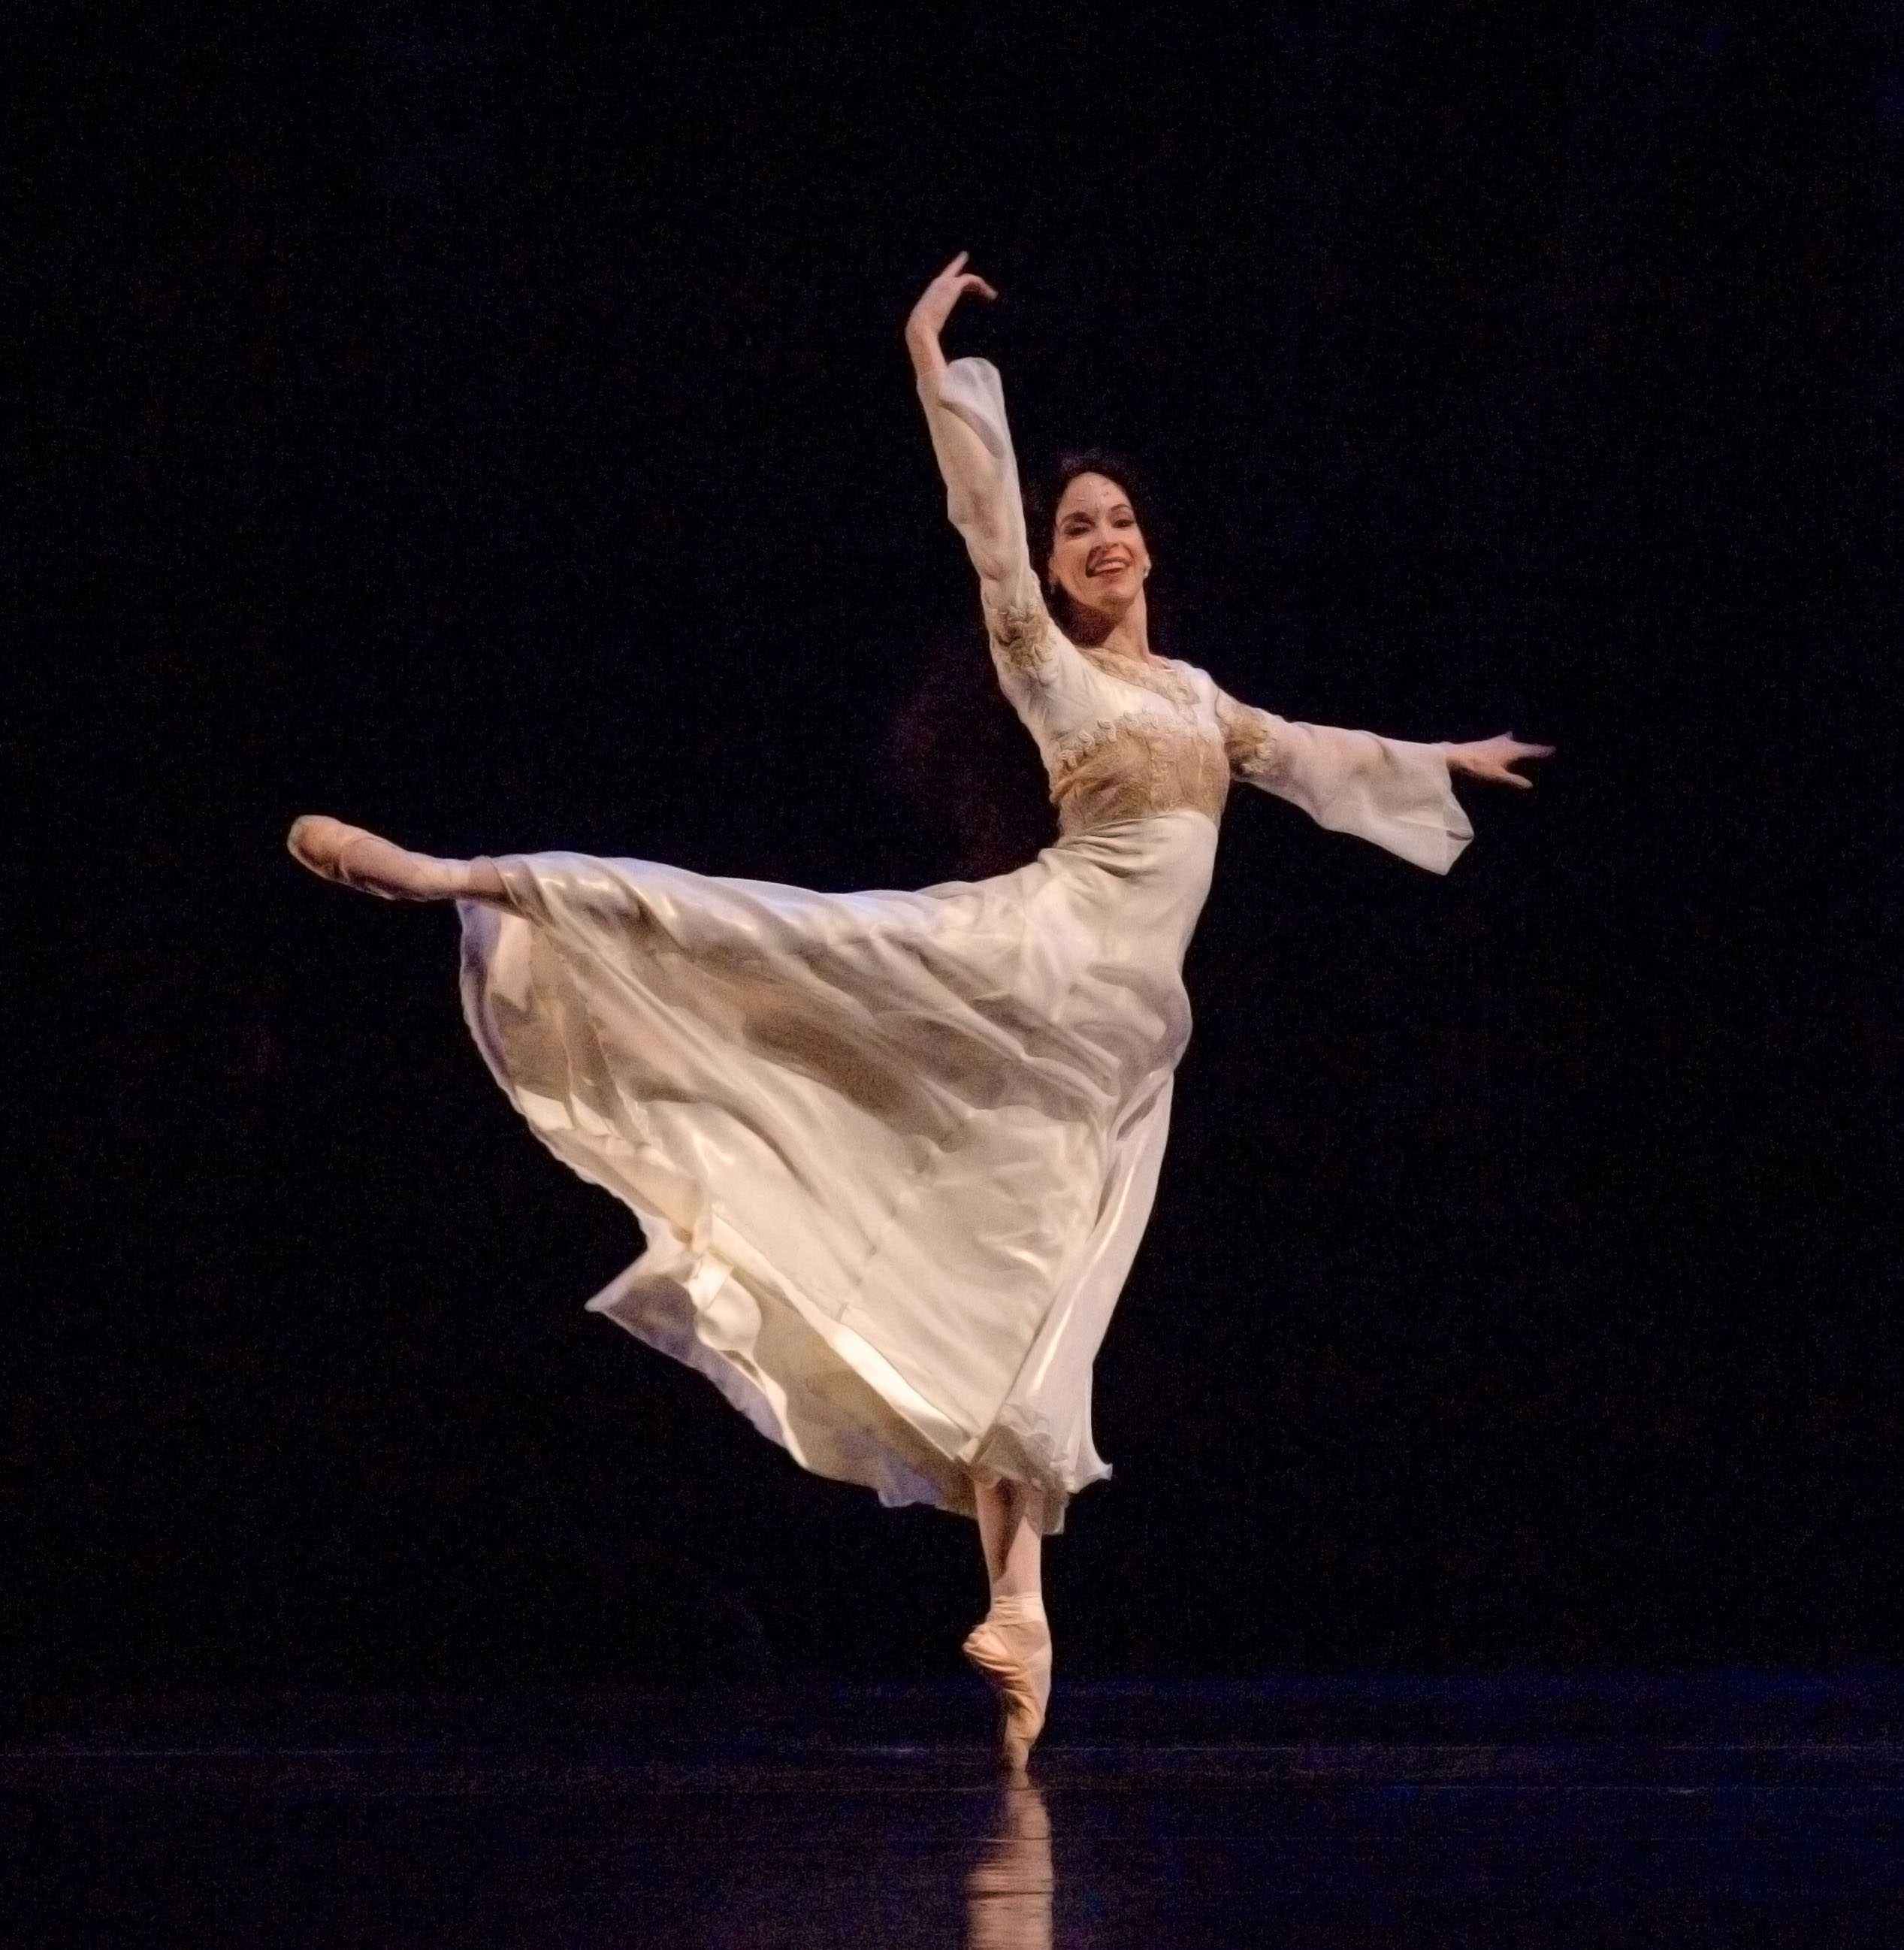 Colorado Ballet S Swan Lake: Cupcakes & Conversation With Mireille Hassenboehler